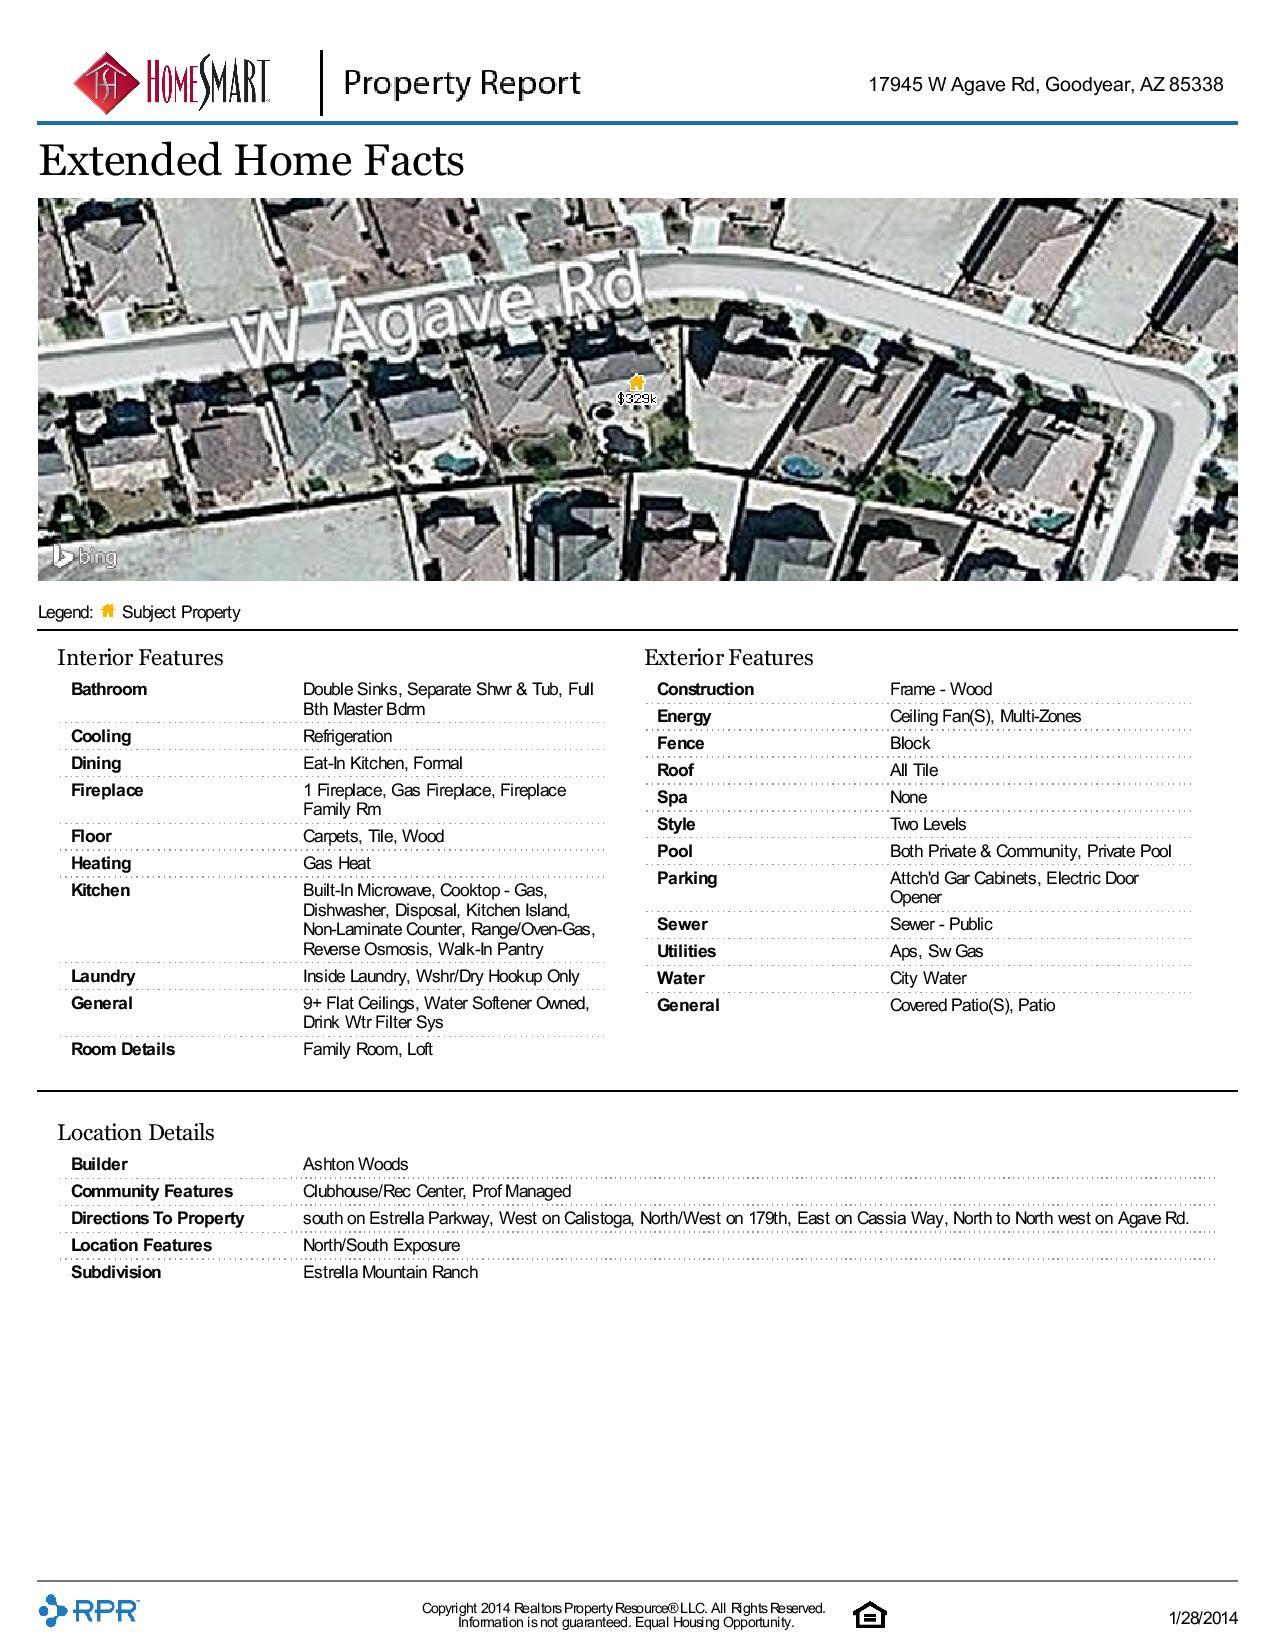 17945-W-Agave-Rd-Goodyear-AZ-85338.pdf-page-004